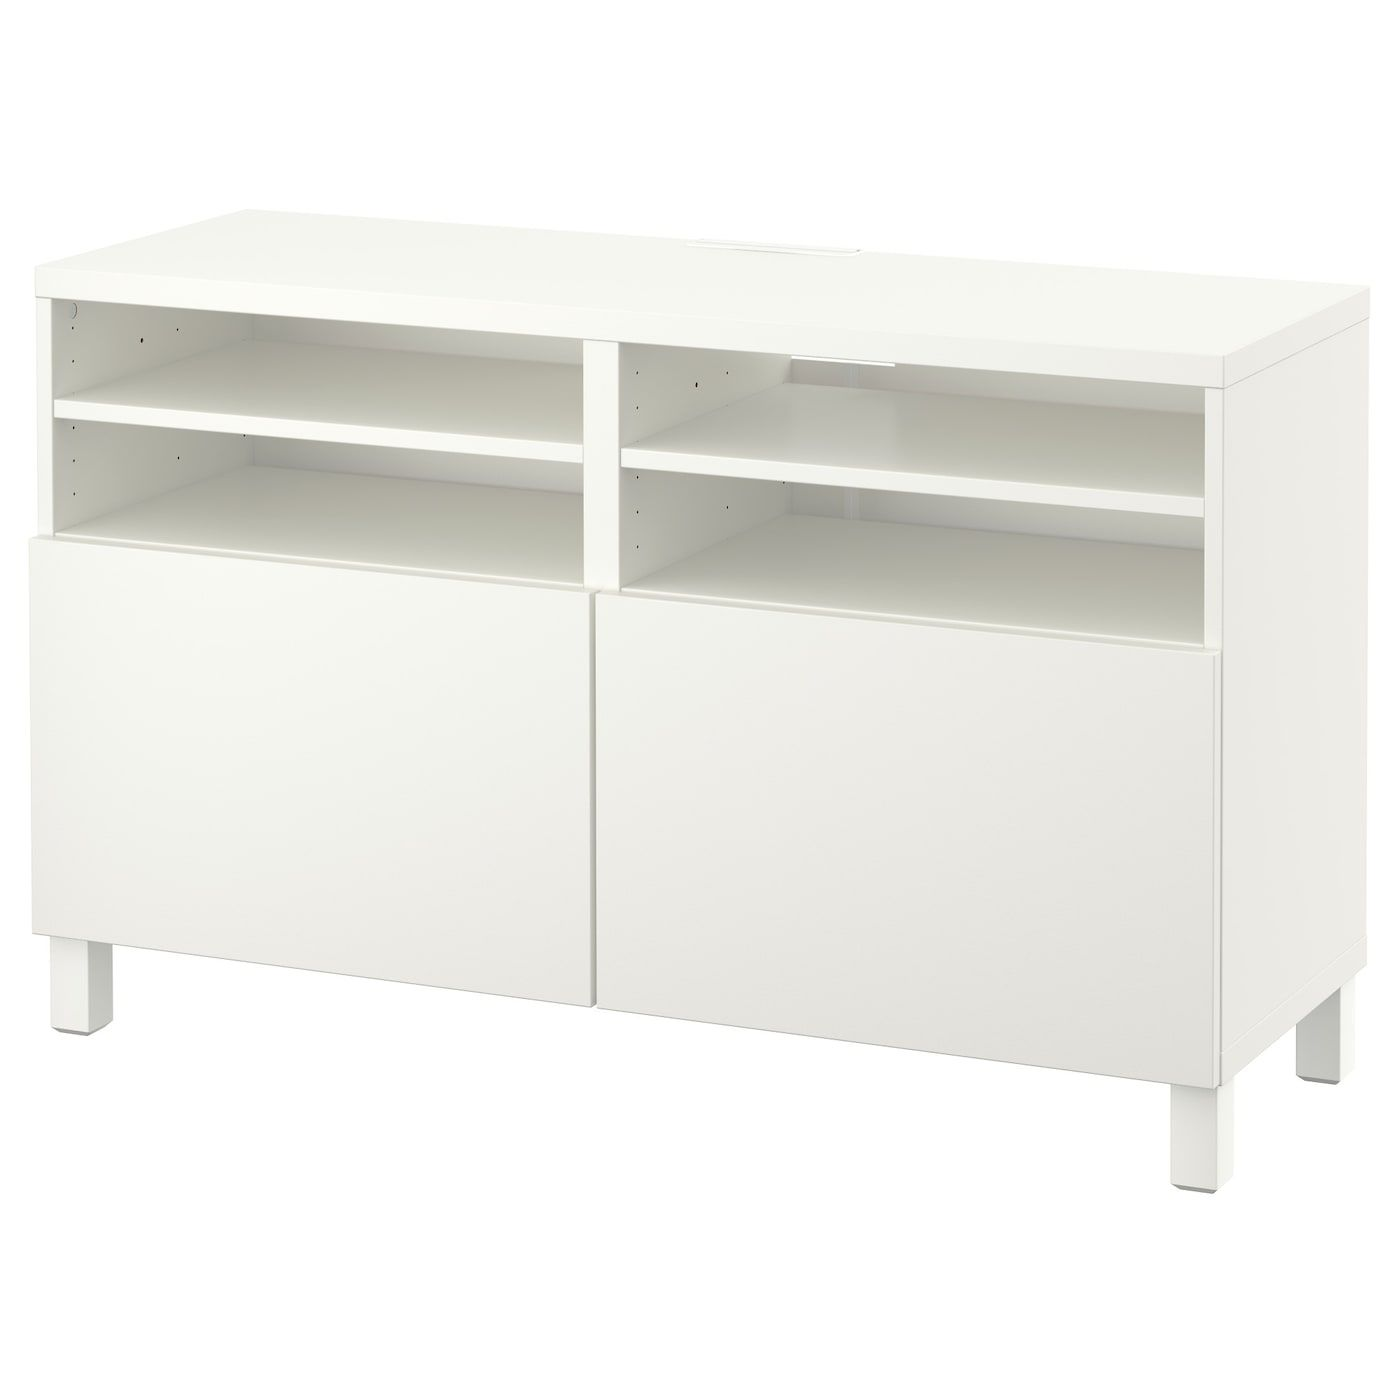 Ikea Besta Tv Unit With Doors Lappviken White Lappviken Stubbarp Tv Unit White Tv Unit Tv Cabinet Ikea